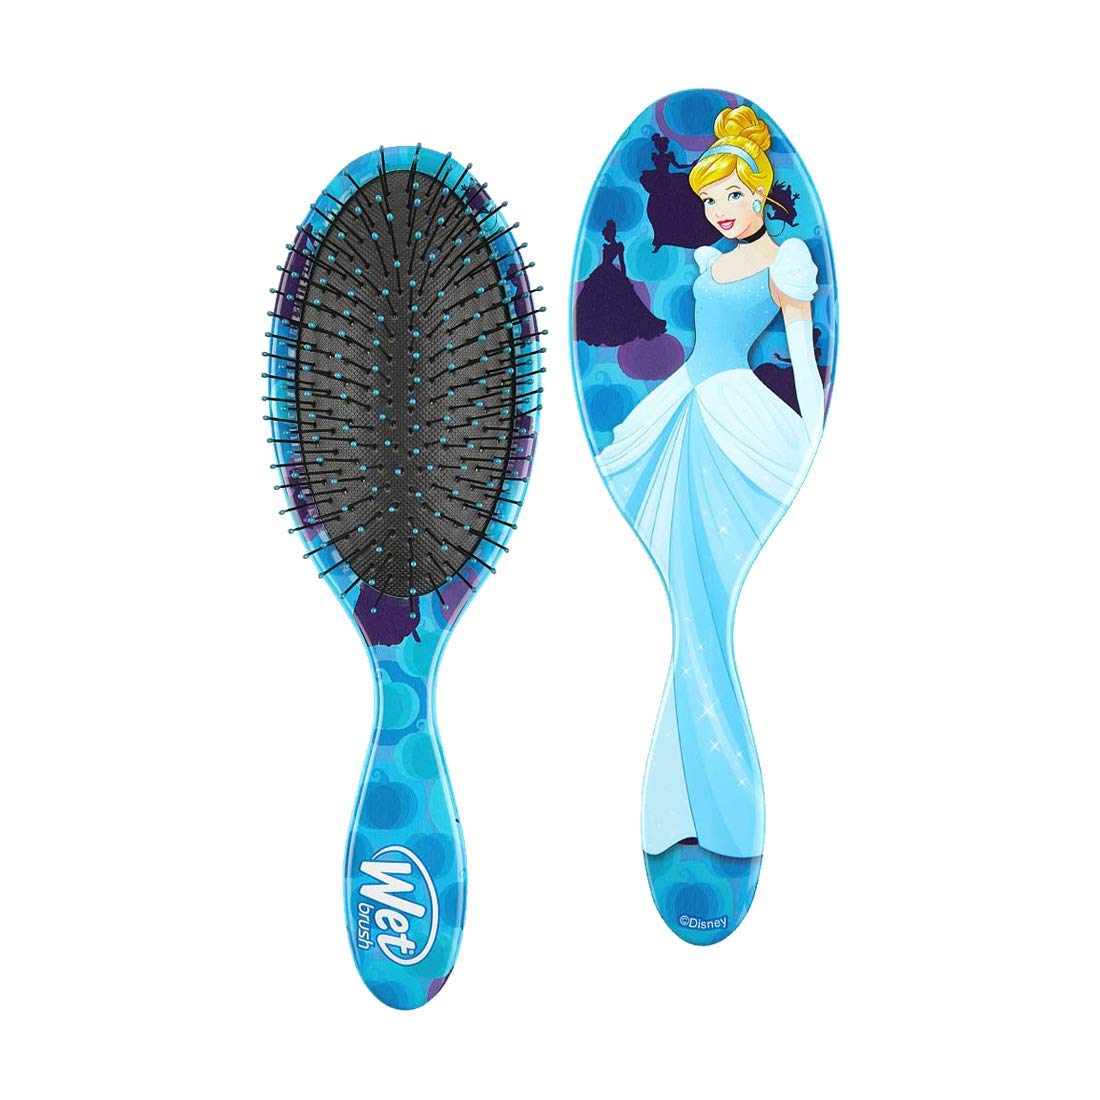 Wet Brush Original Detangler Disney Princess Collection - Cinderella